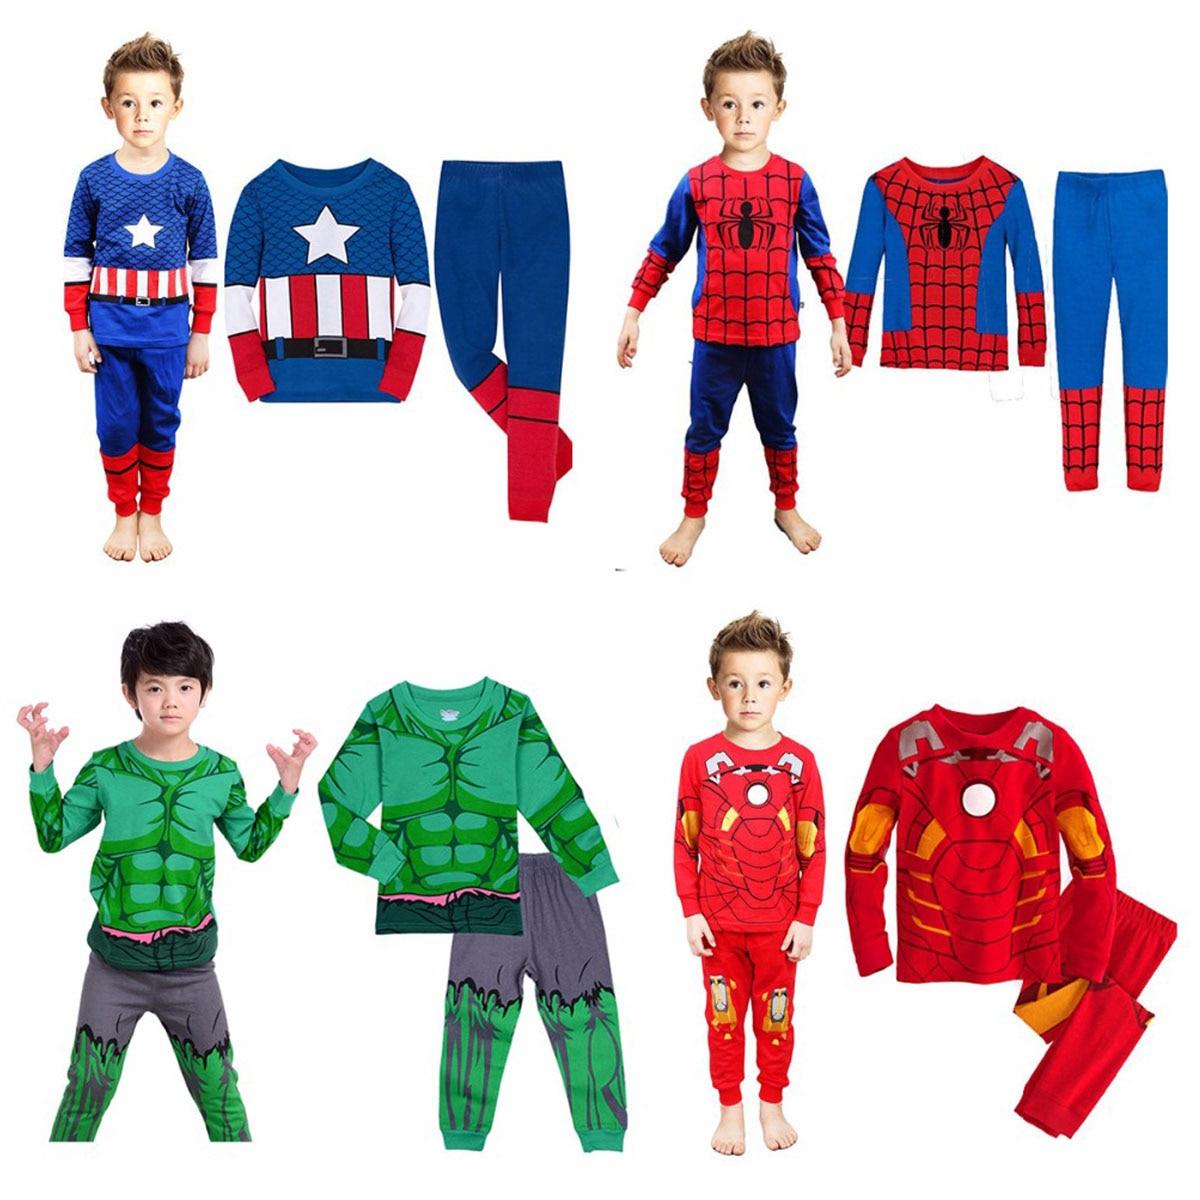 Kid Boy Superhero Hulk Captain Spiderman Pajamas Set Children Avengers Ironman Cartoon Sleepwear Child Cosplay Halloween Costume